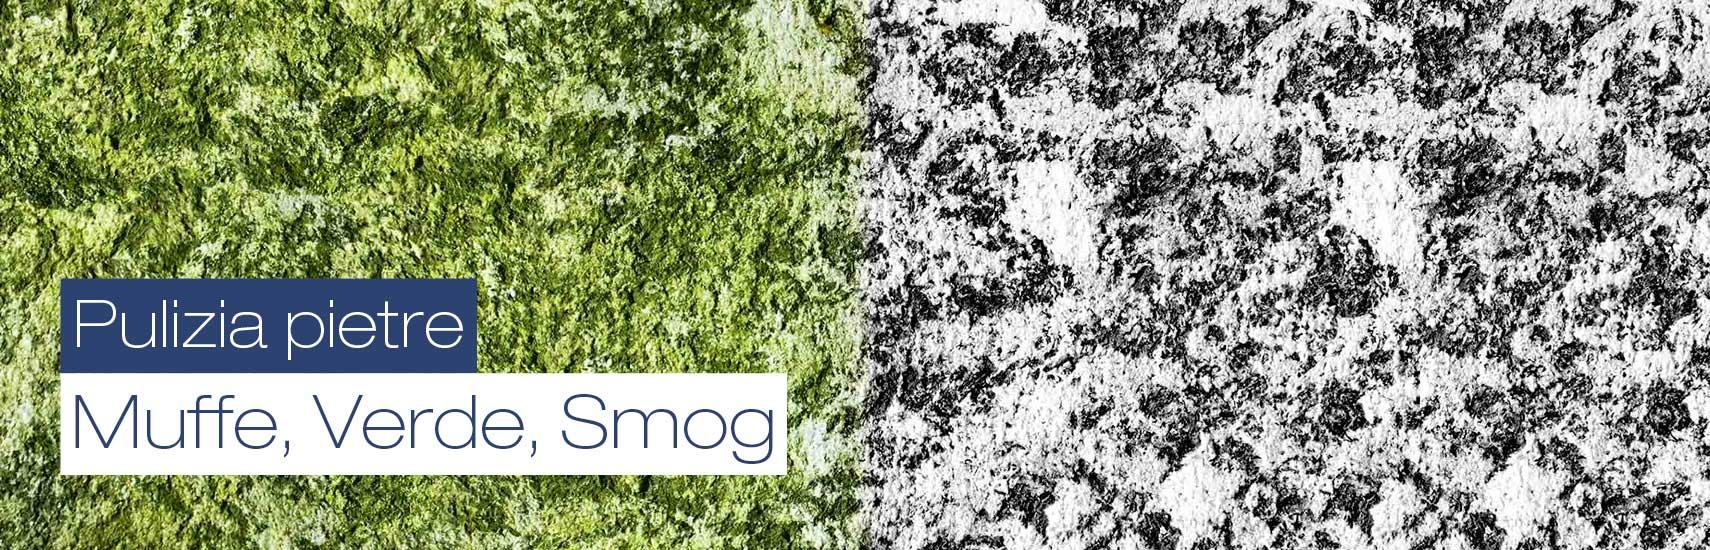 Muffe, Verde, Smog